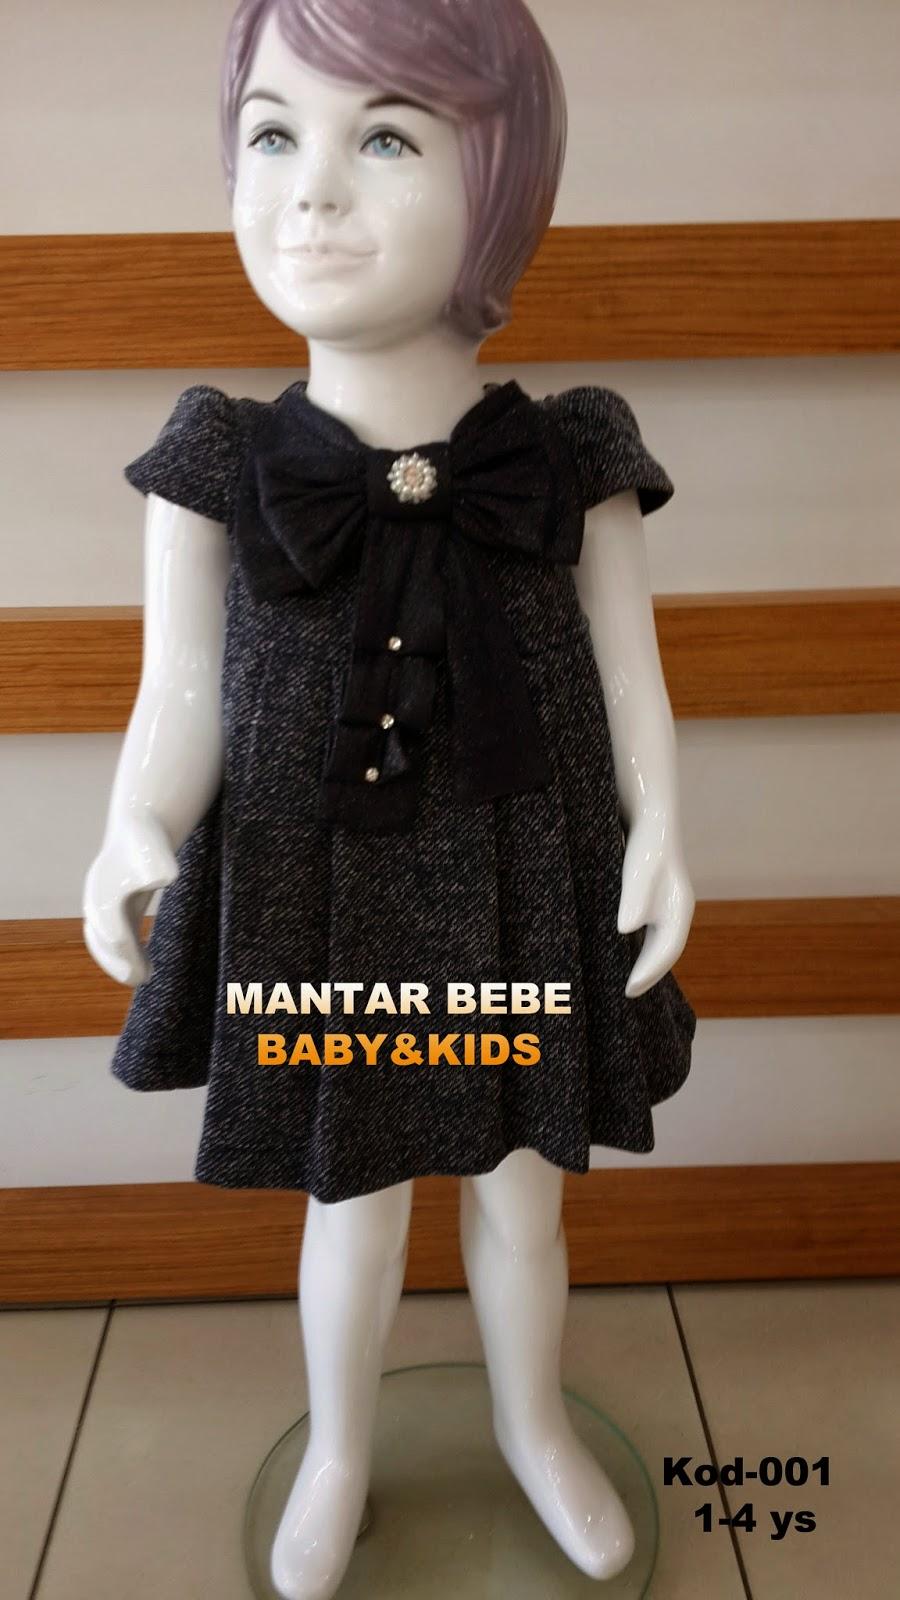 MANTAR BEBE ÇOCUK GİYİM - KOD001